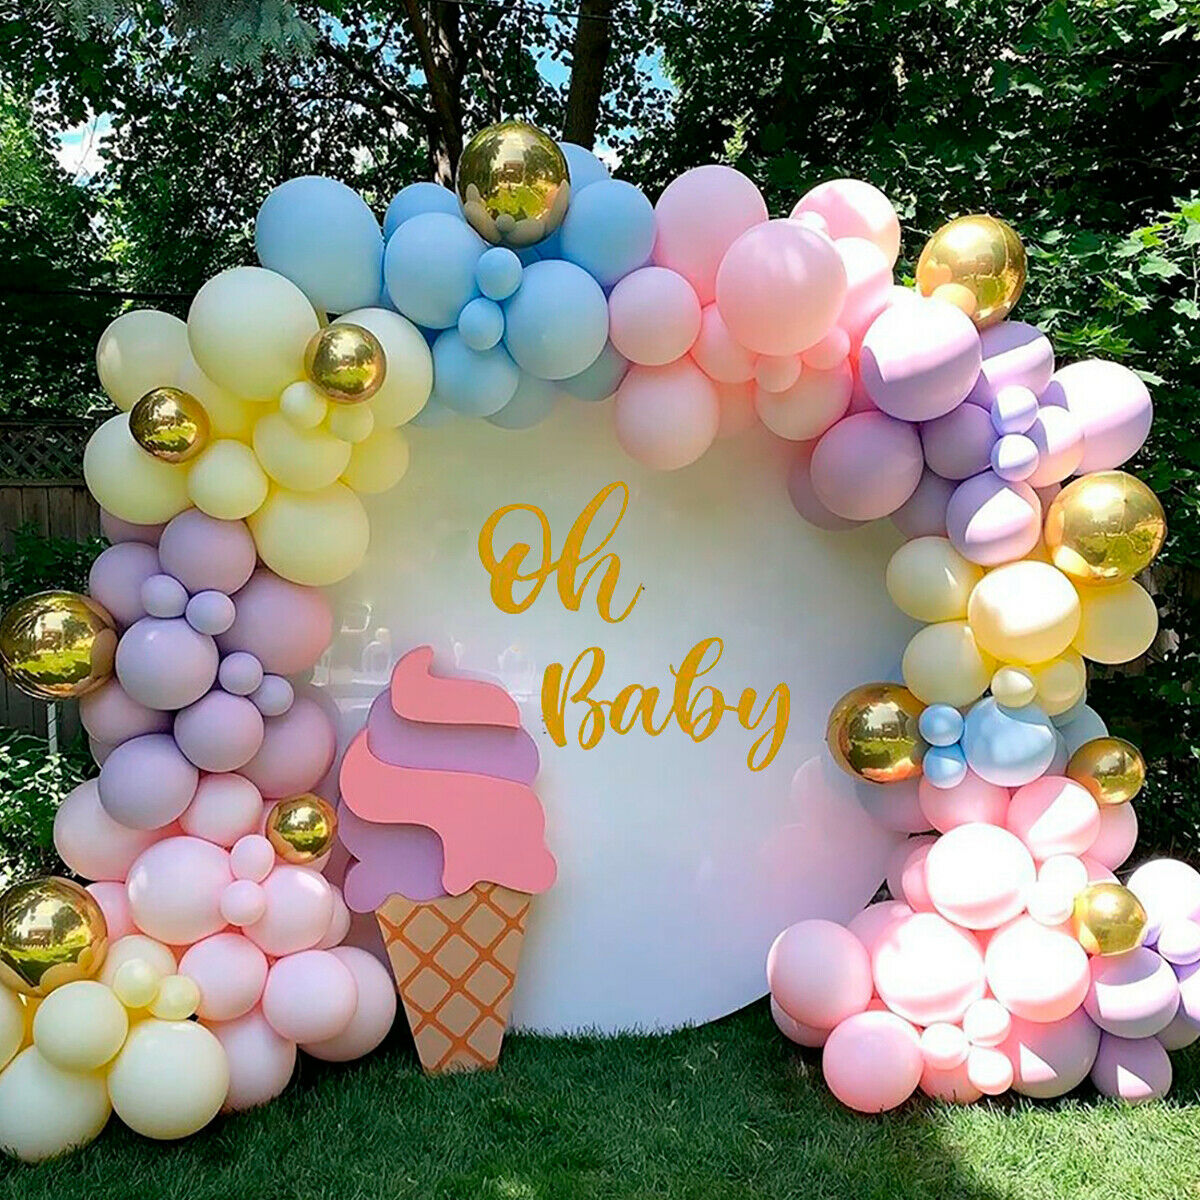 Wedding Macaron Pastel Balloon Arch Garland Kit Baby Shower Birthday Party Decor Ebay